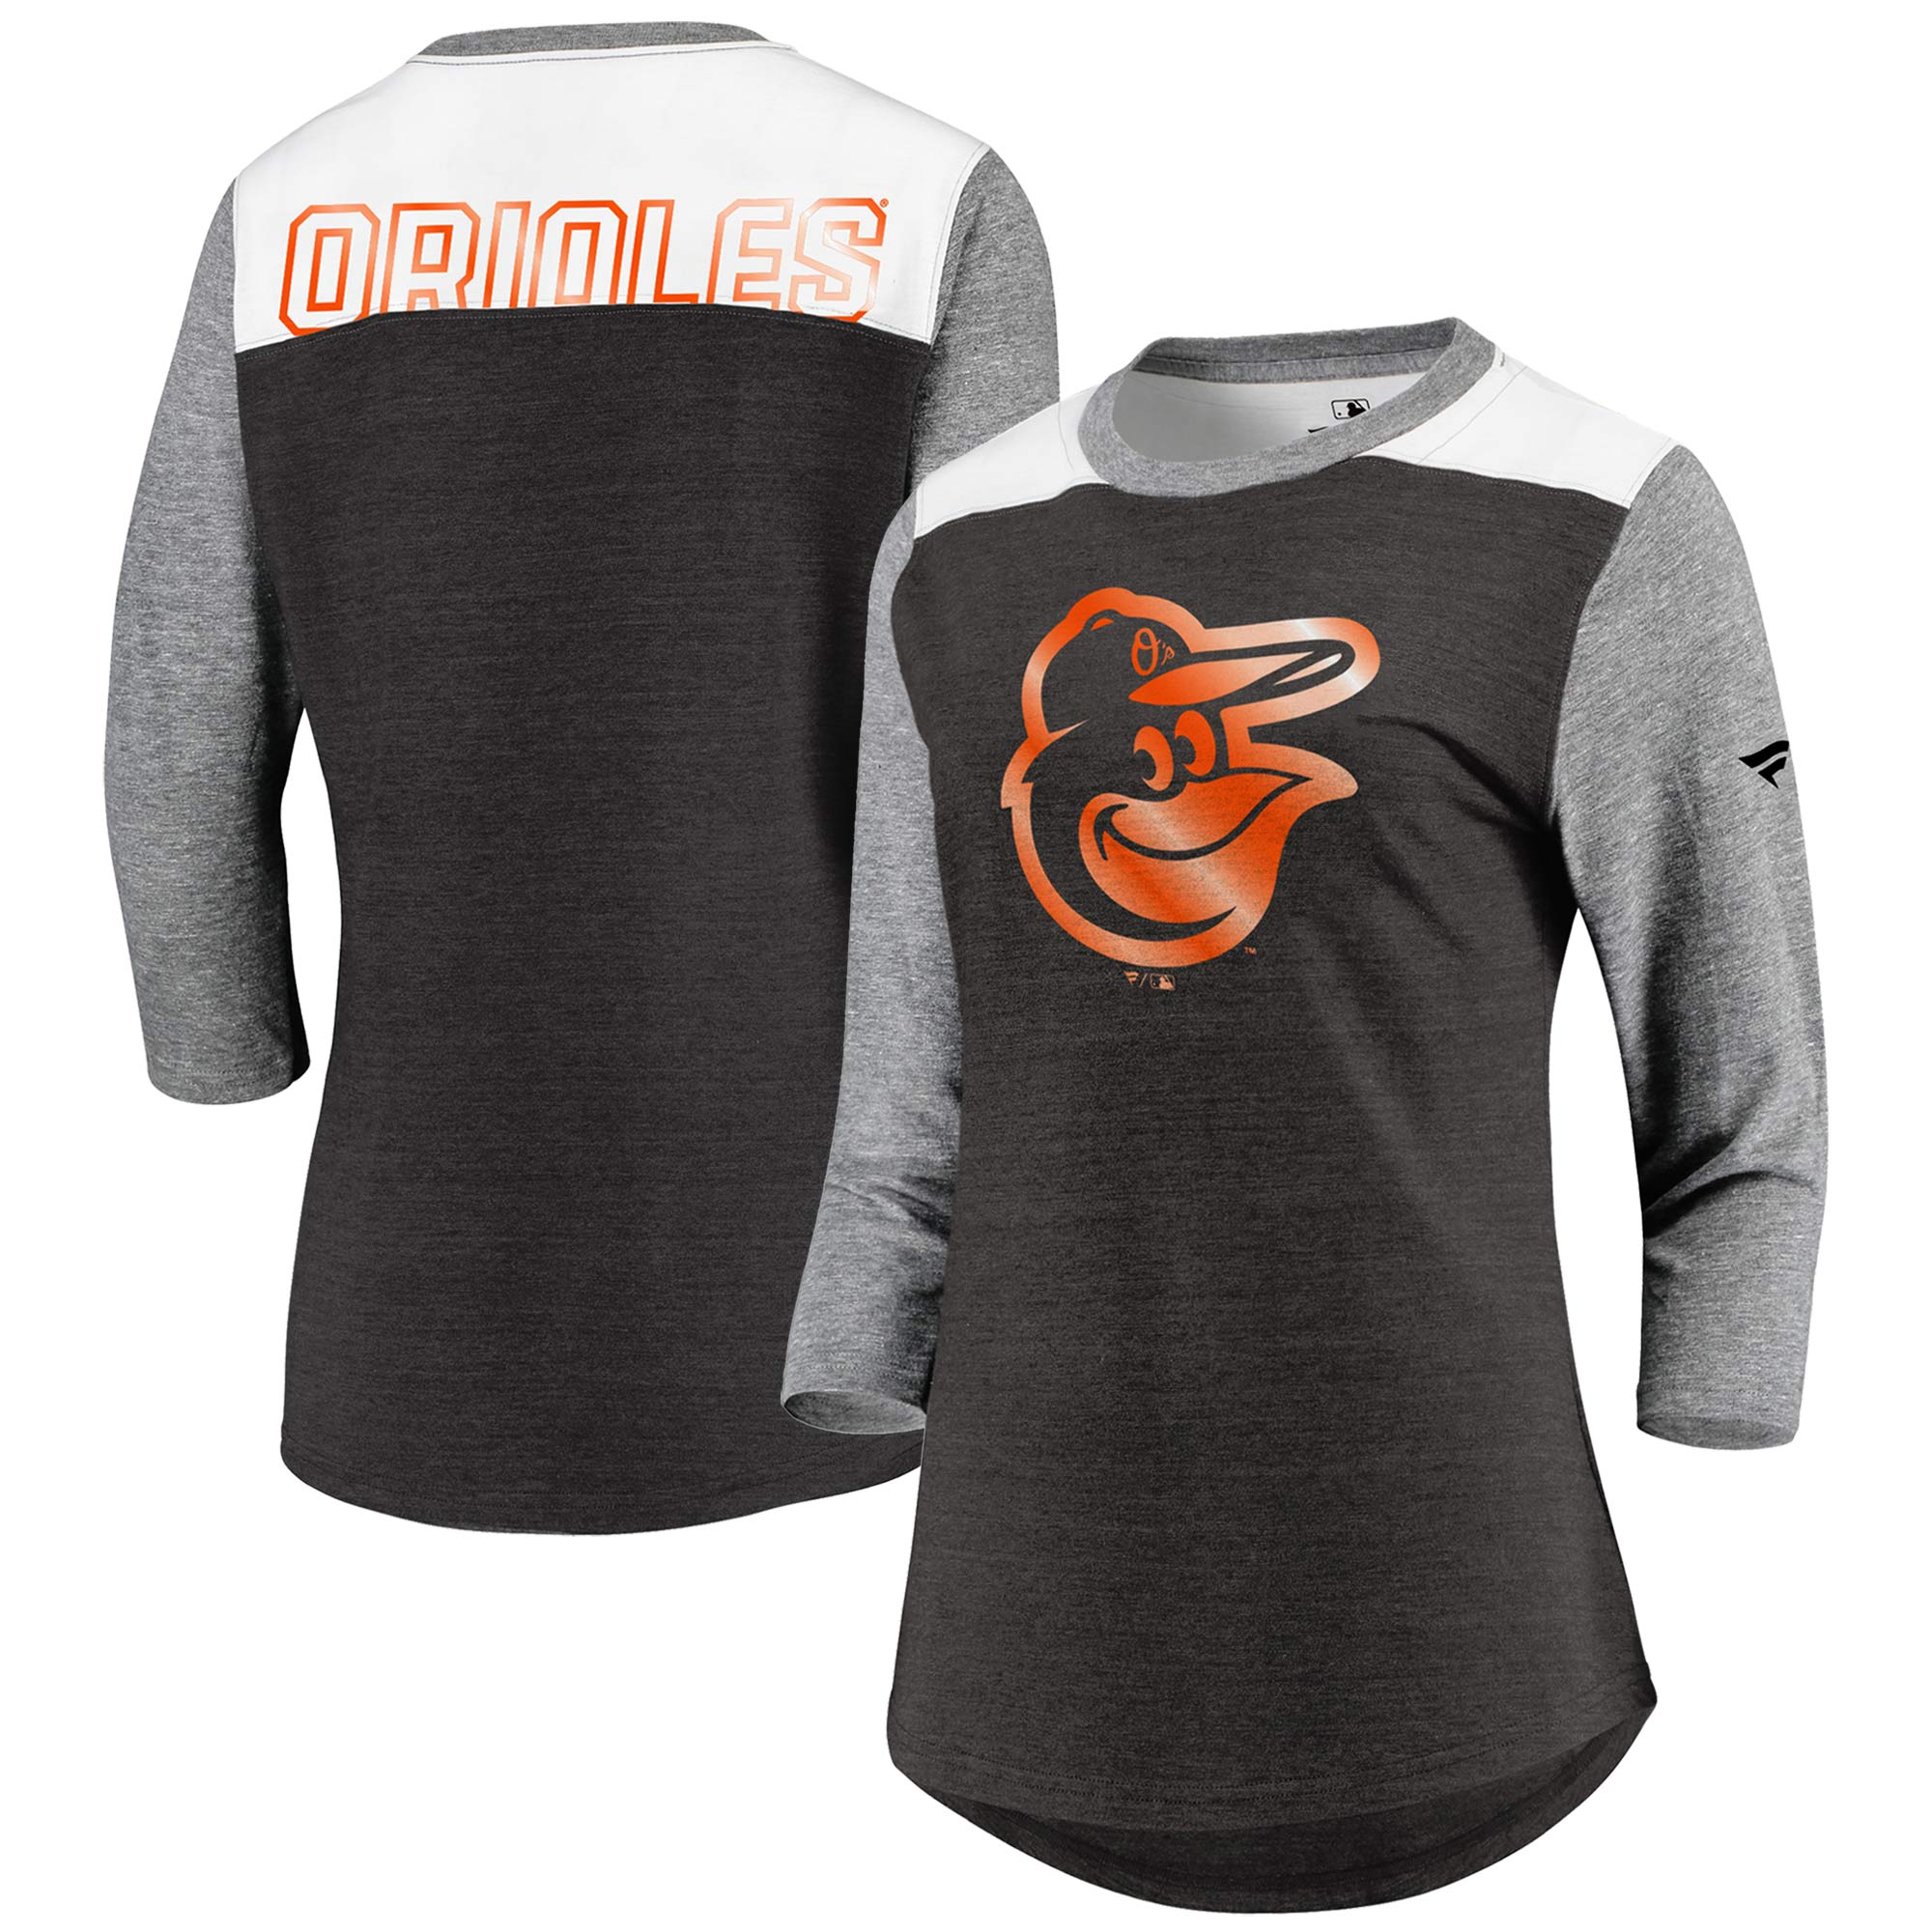 Baltimore Orioles Fanatics Branded Women's Iconic Tri-Blend 3/4 Sleeve T-Shirt - Black/Gray